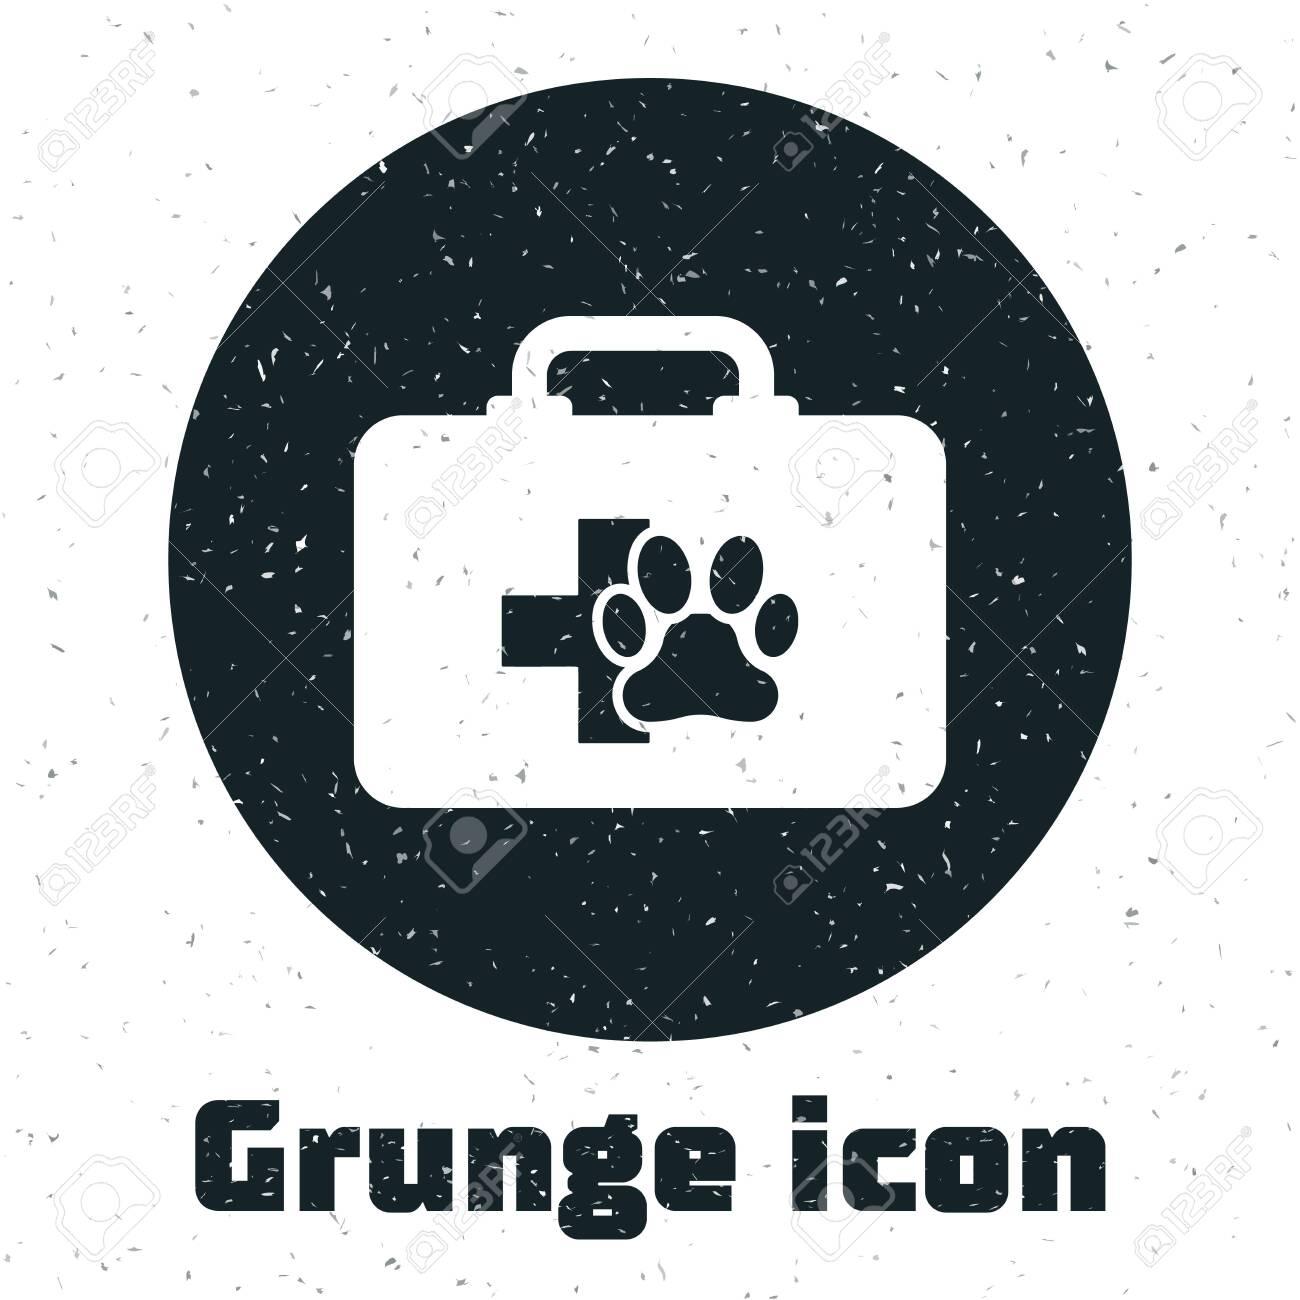 Grunge Pet first aid kit icon isolated on white background  Dog